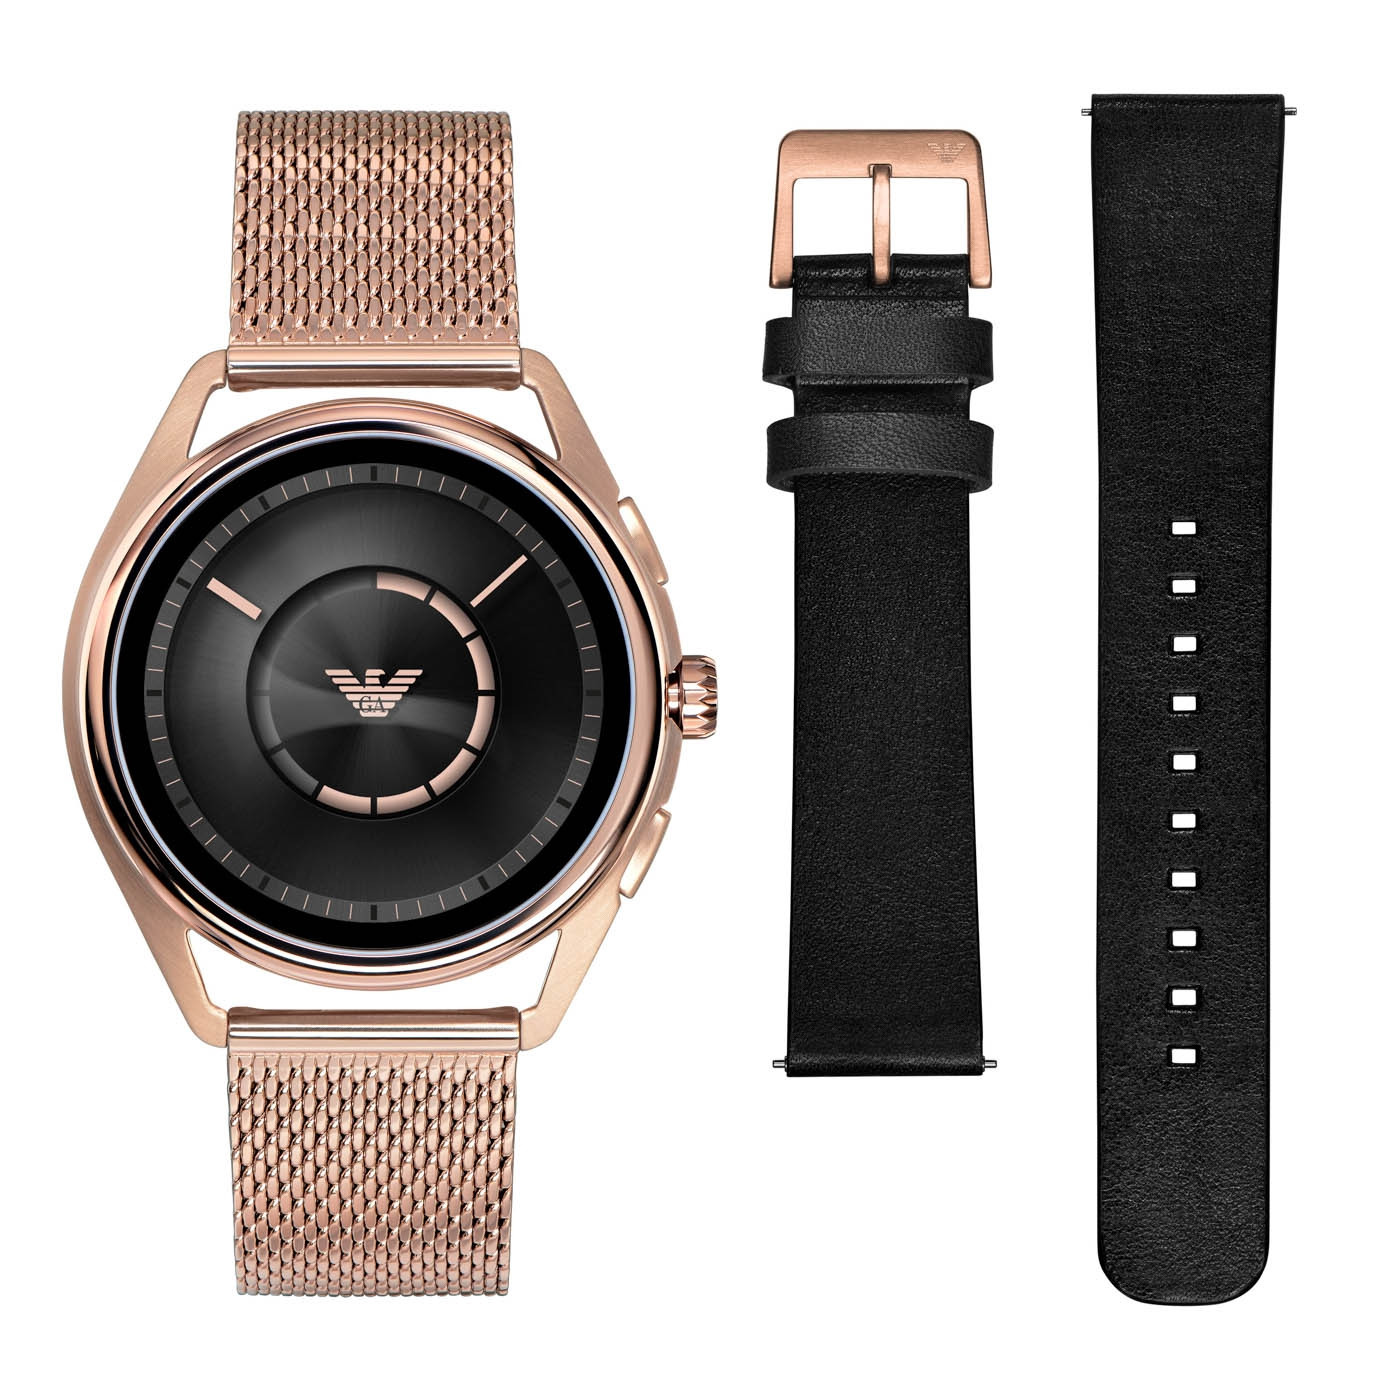 Emporio Armani Connected Matteo Gen 4 Display Smartwatch Giftset ART9005